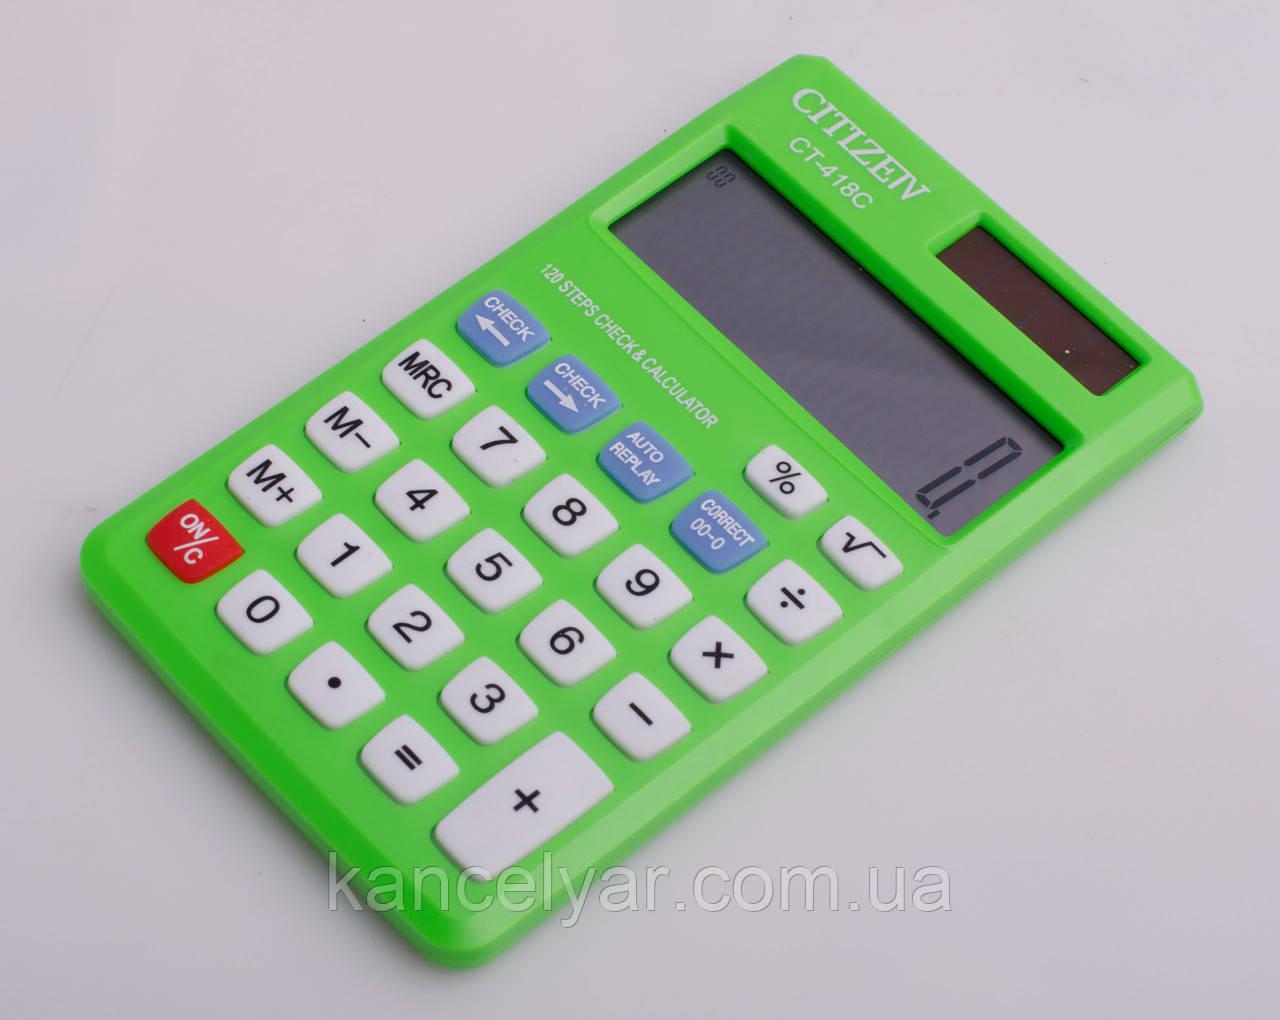 Калькулятор CITIZEIV, 7х12 см